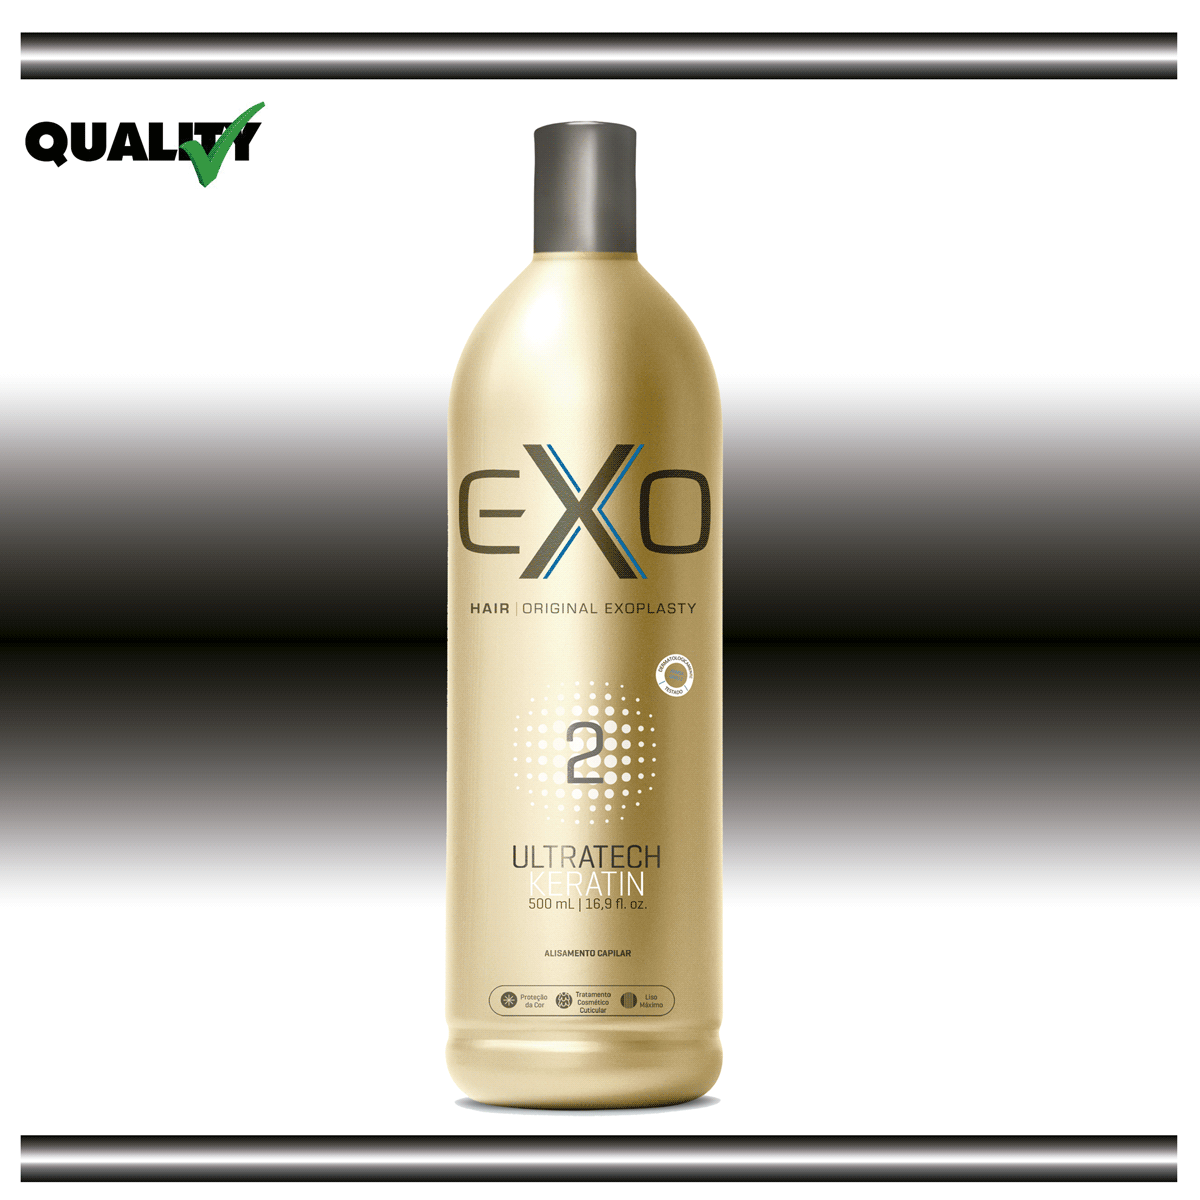 2e9699d6b Exoplastia Capilar Ativo Ultratech Keratim 500 ml - Total Hair ...